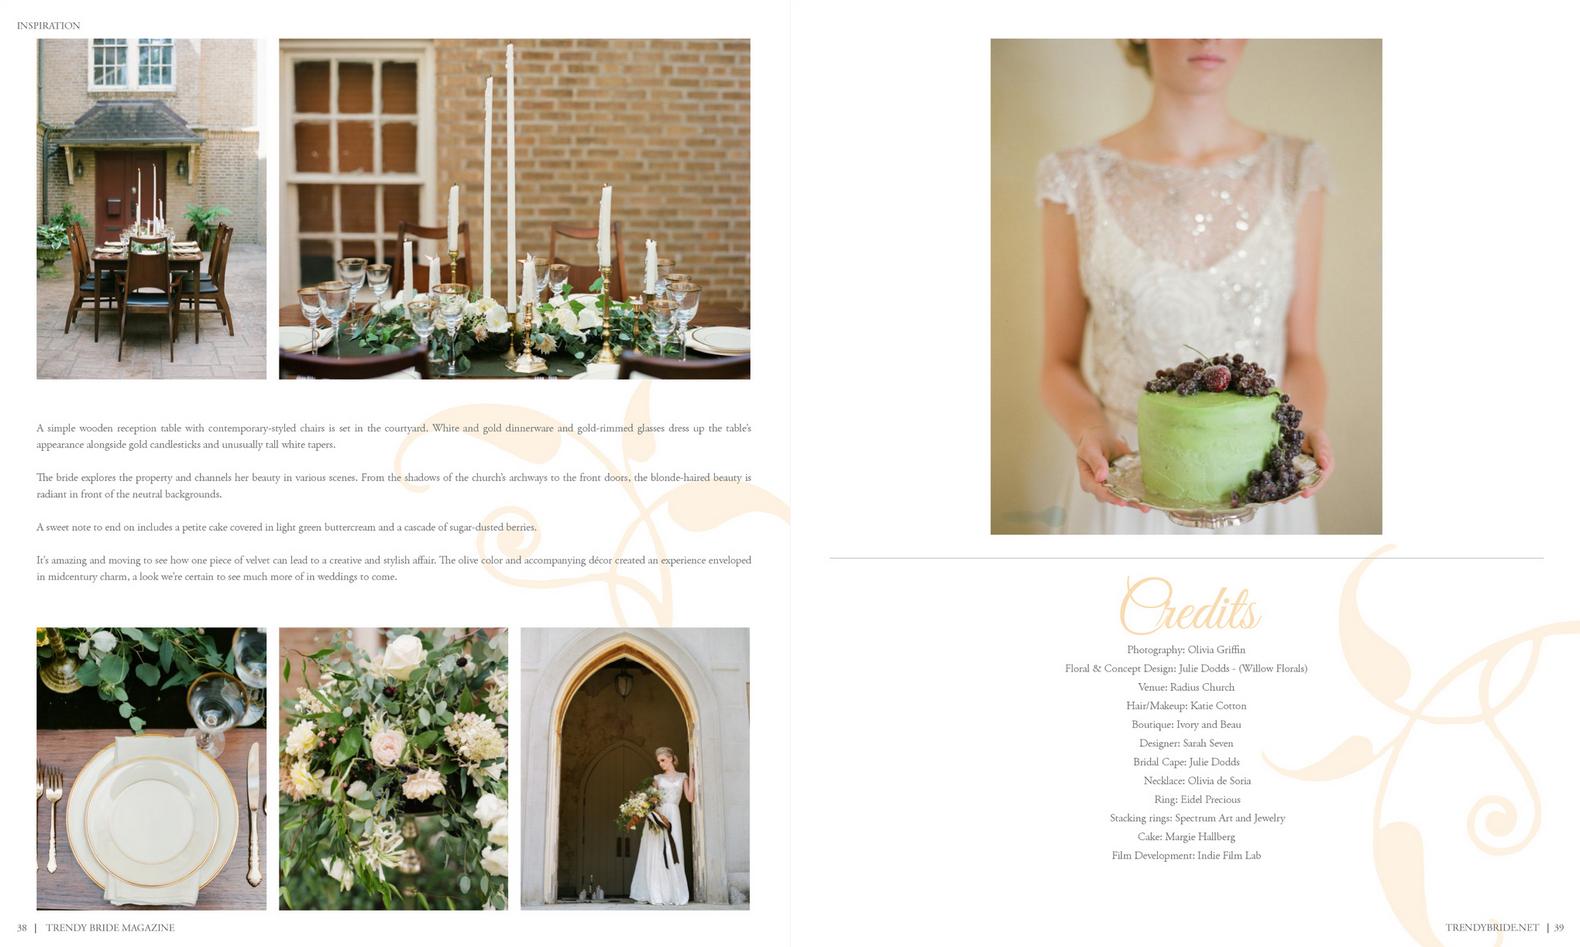 trendy-bride-magazine-ivory-and-beau-savannah-bridal-boutique-sarah-seven-gwen-savannah-wedding-dresses-silver-sequins-olivia-griffin-photography-willow-florals-radius-church.png